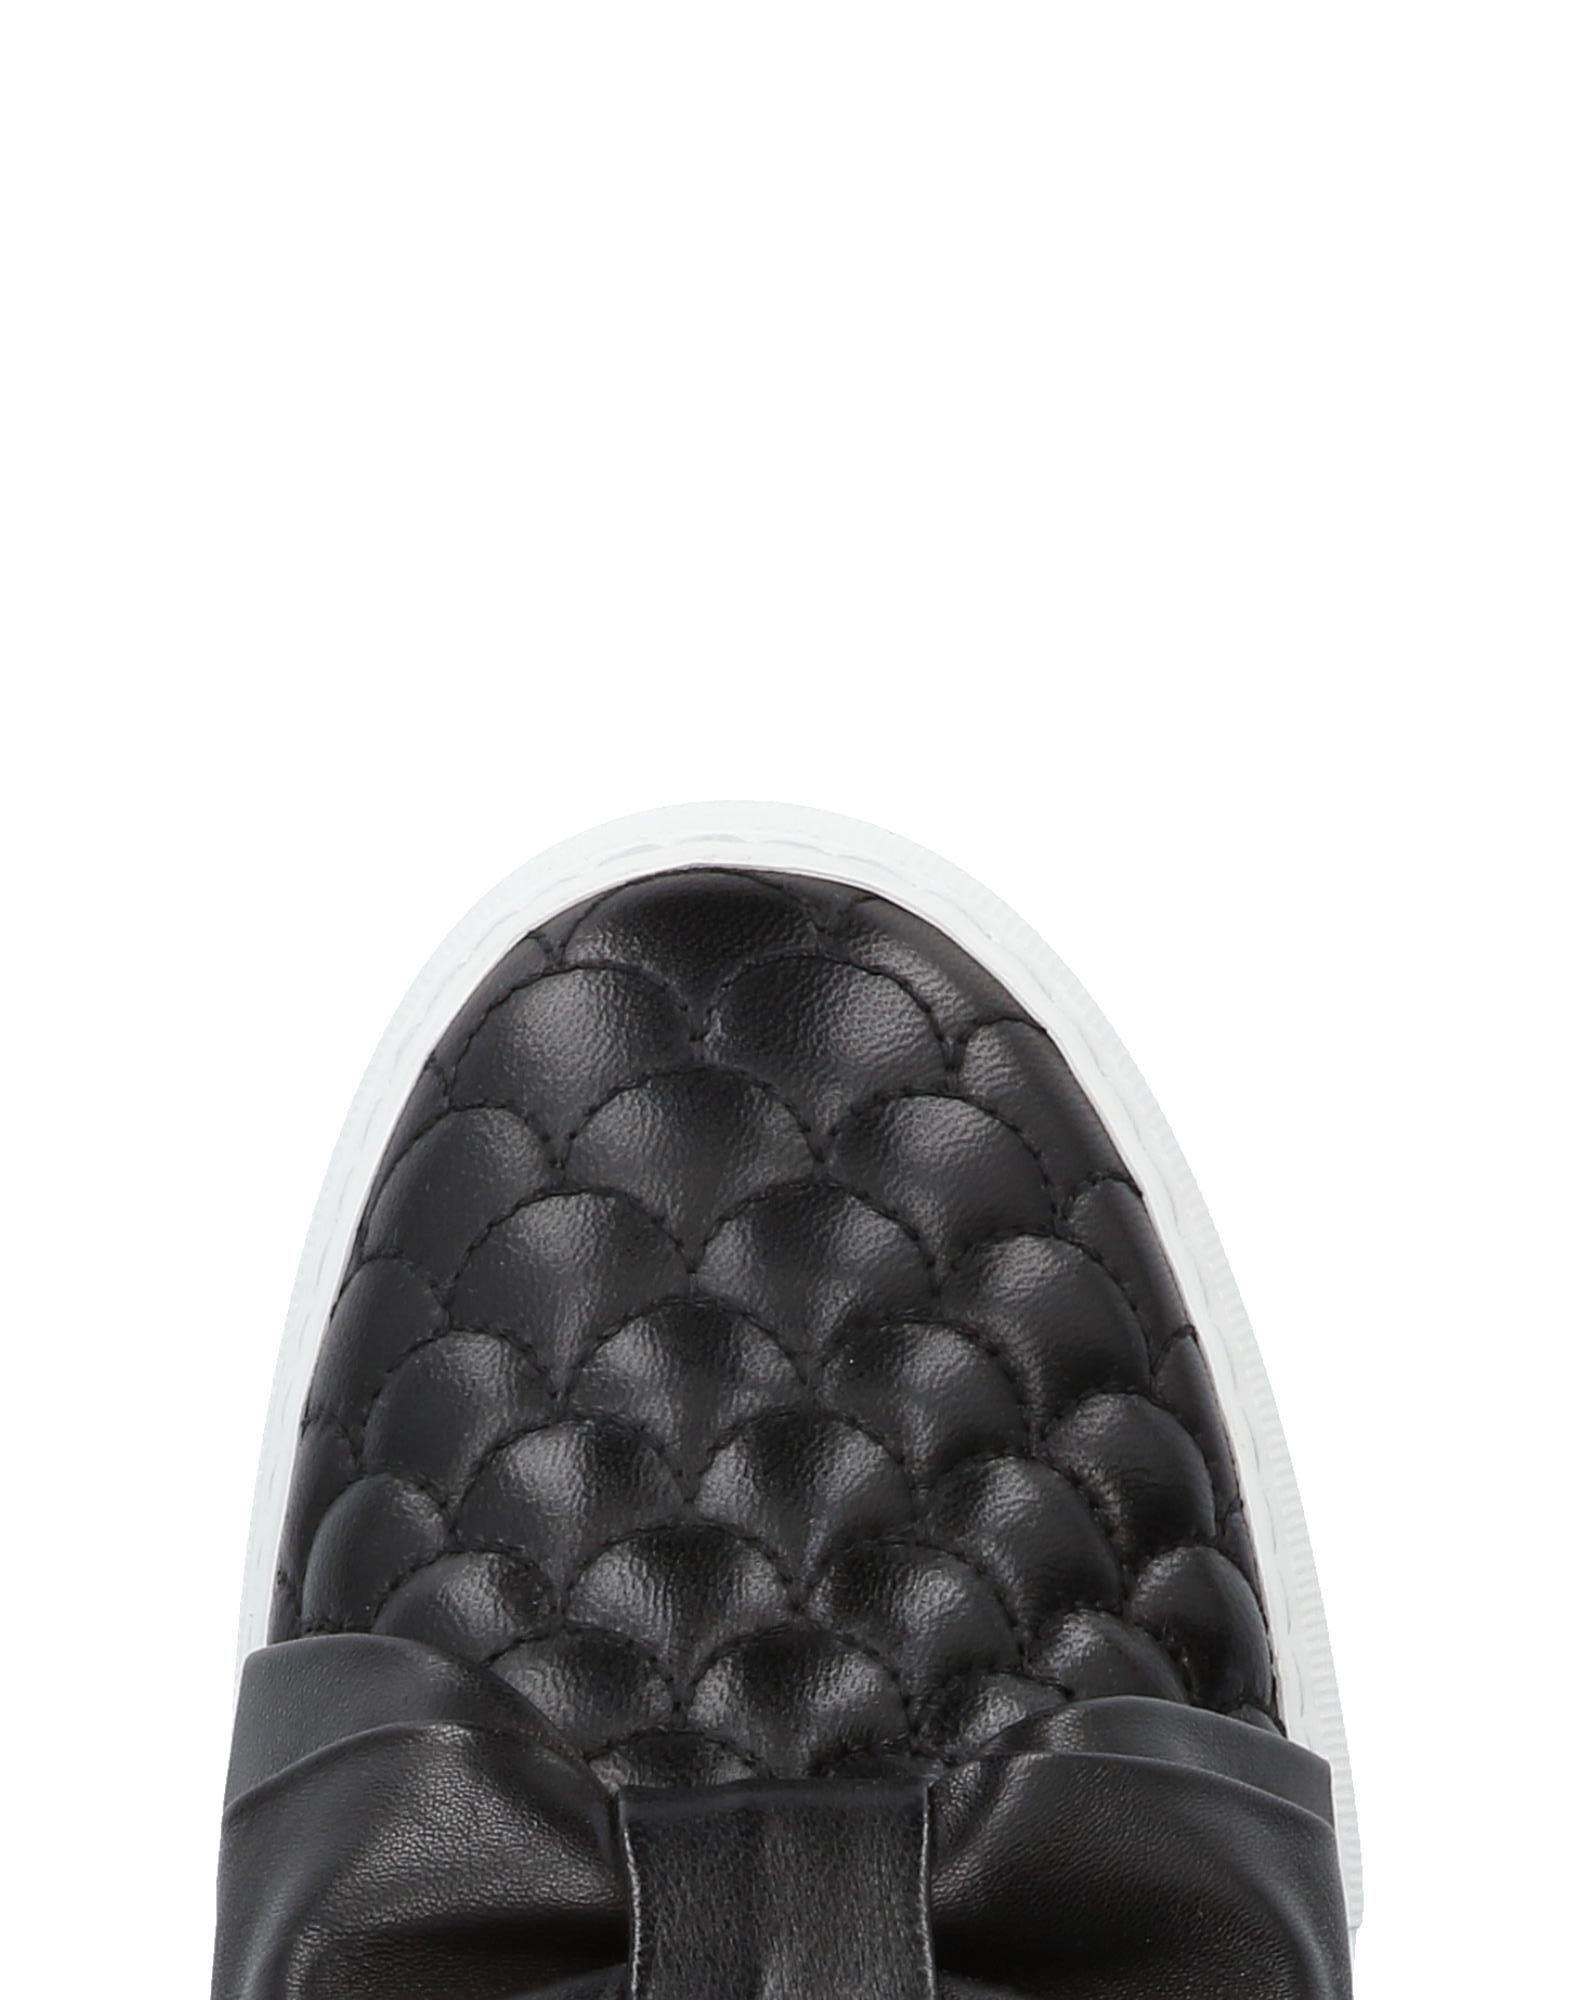 Buscemi Sneakers Damen Schuhe  11427220LCGünstige gut aussehende Schuhe Damen e65ac9